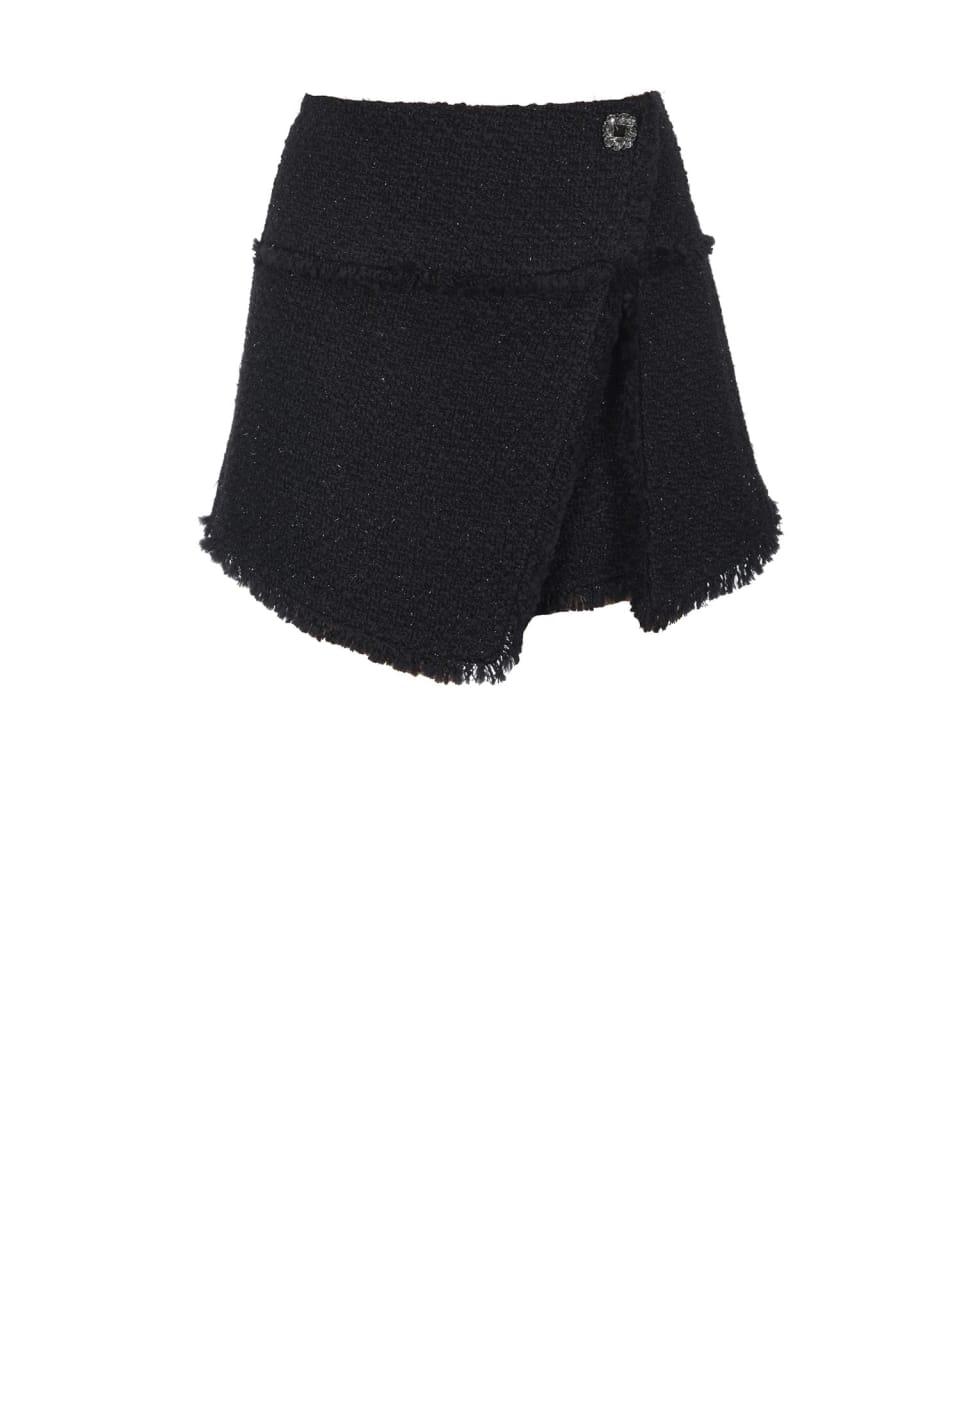 Shorts de esterilla de lúrex